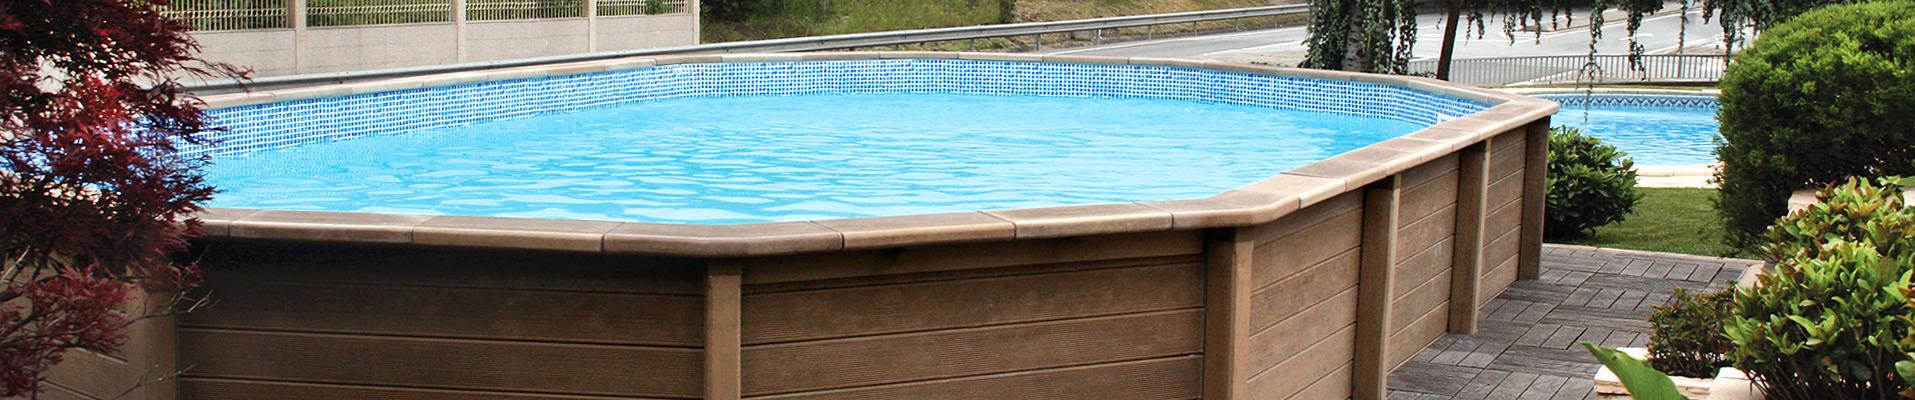 piscinas_naturalis_-01